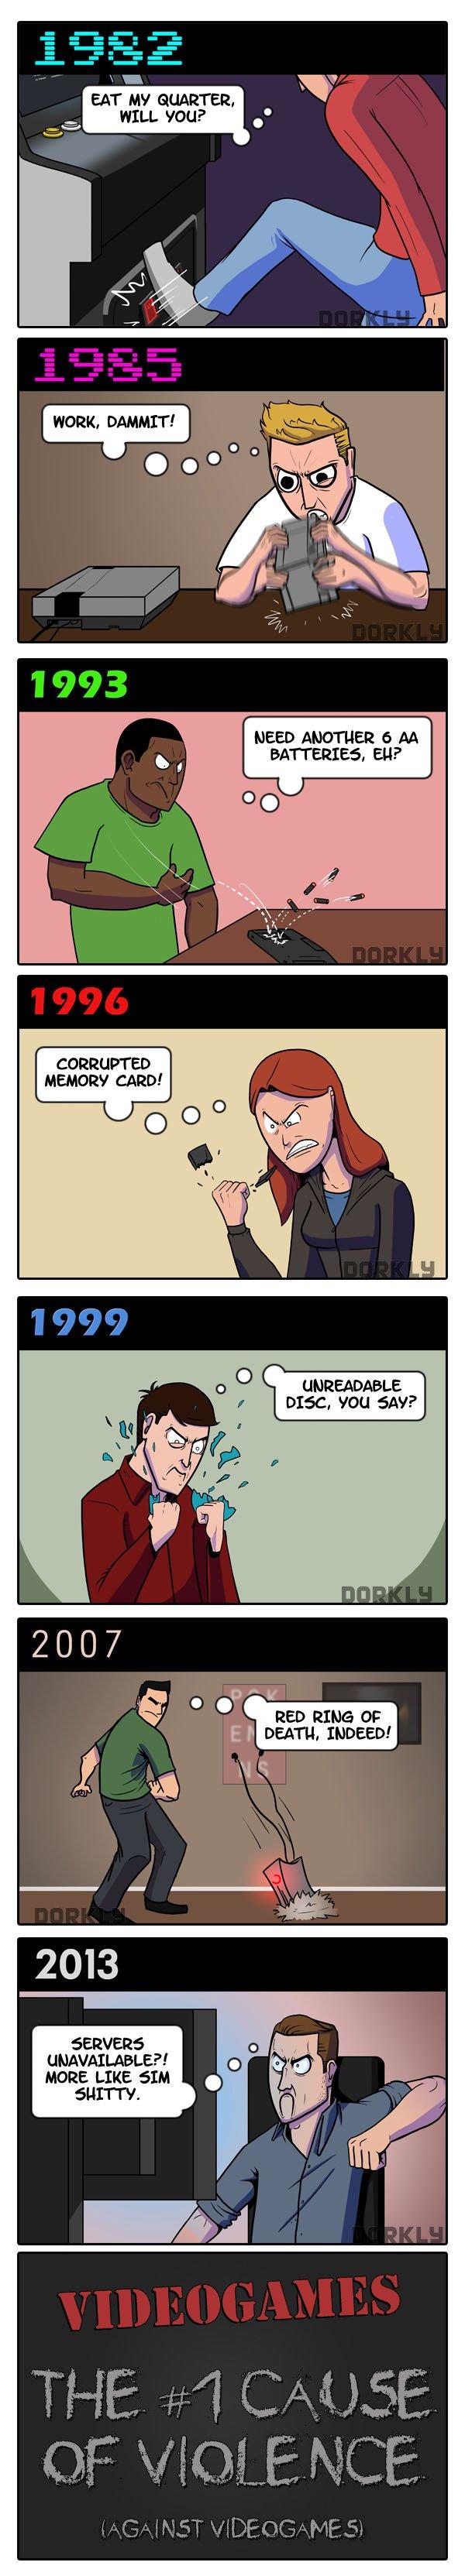 video_games_violence_comic